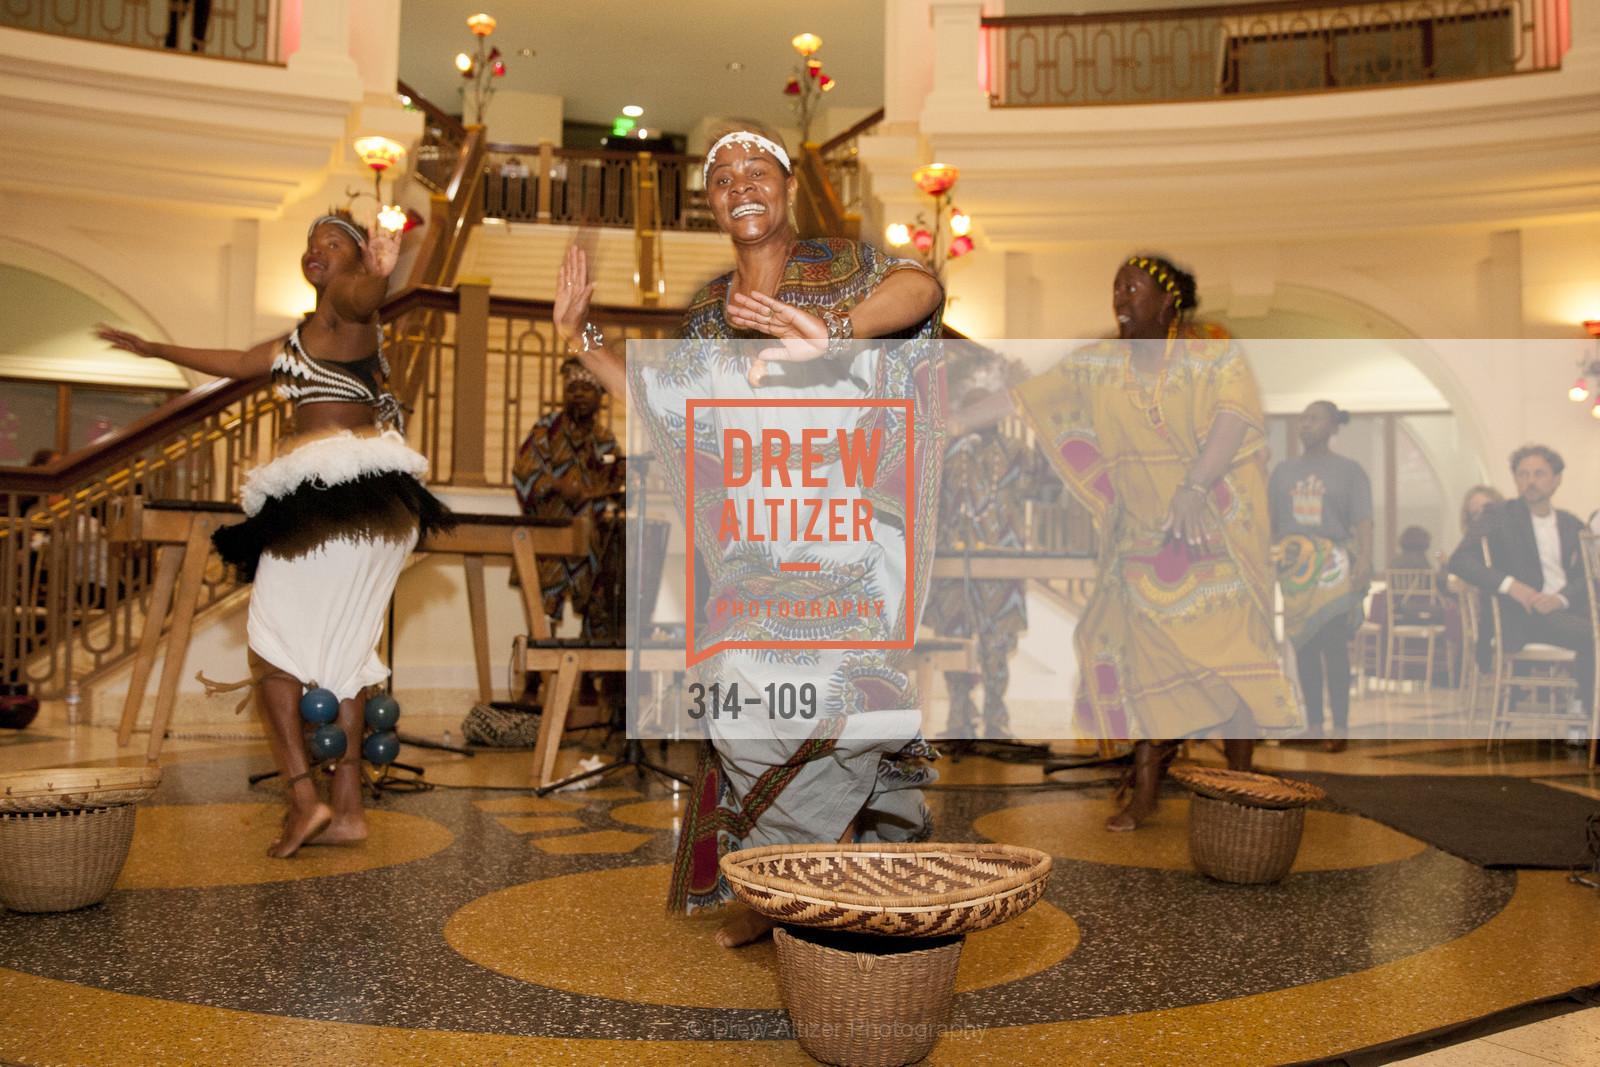 Performance, PANGAEA GLOBAL HEALTH Leadership Dinner at Rotunda in Oakland, The Rotunda. Oakland, May 11th, 2015